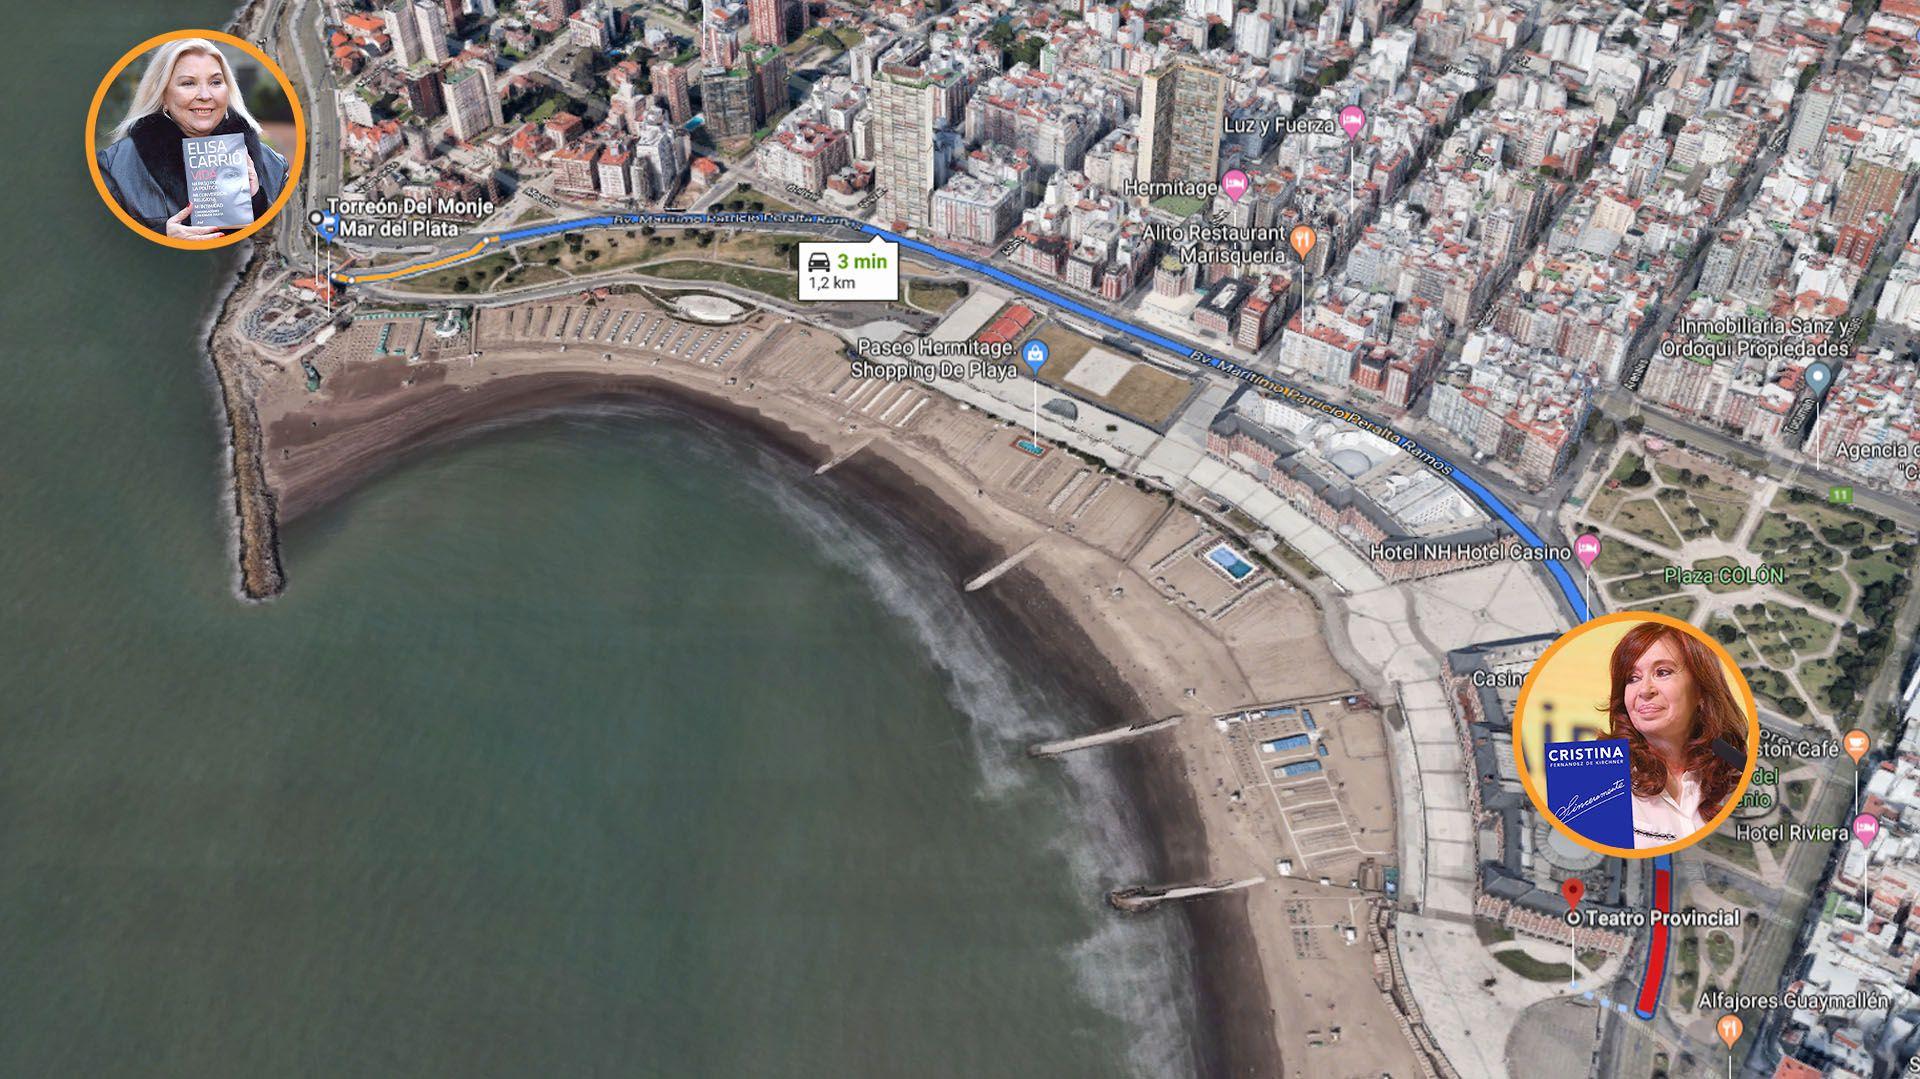 Cristina Kirchner y Elisa Carrió estarán a penas 16 minutos de distancia a pie en Mar del Plata.